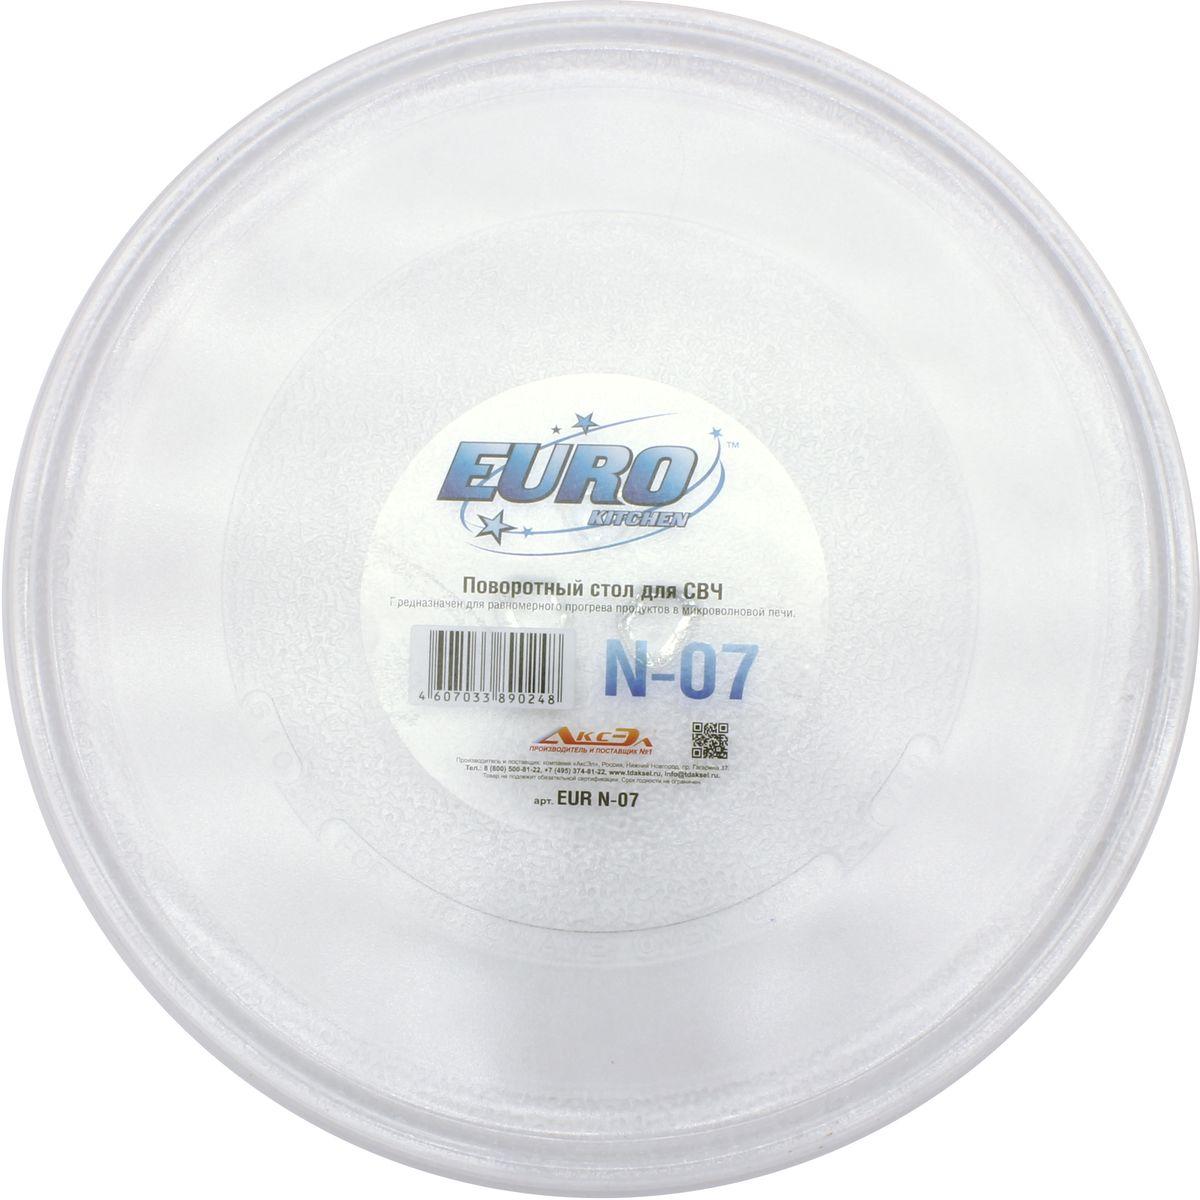 Euro Kitchen N-07 тарелка для СВЧN-07Универсальная тарелка N-07 для микроволновой печи с куплером. Диаметр тарелки 265 мм. Изготовлена из специального жаропрочного стекла. Предназначена для равномерного разогрева продуктов в микроволновой печи.Подходит для брендов: Aeg, Airhot, Amica, Ardo, Ariston, Asko, Atlanta, Aurora, Ava, Barazza, Bauknecht, Bbk, Beko, Bomann, Bork, Bosch, Brandt, Candy, Cata, Centek, Clatronic,Daewoo, De dietrich, Delfa, Electrolux, Elenberg, Ergo, Erisson, Eurotec, Fagor, Fimar, Foster, Franke, Fulgor, Fusion, Gaggenau, Gastrorag, Goldstar, Gorenje, Hankel, Hansa, Hilton, Horizont, Hurakan, Hyundai, Ilve, Indesit, Kaiser, Kenmore, Kenwood, Korting, Kuppersberg, Kuppersbusch, Kamark, Keran, Lg, Liberton, Liberty, Maxwell, Menumaster, Midea, Miele, Moulinex, Mystery, Neff, Oursson, Panasonic, Proficook, Rainford, Redmond, Rolsen, Samsung, Saturn, Scarlett, Sencor, Sharp, Siemens, Simfer, Sinbo, Sirman, Smeg, Supra, Teka, Thomson, Toshiba, V-zug, Vasko, Vimar, Vitek, Vr, Weissgauff, West, Whirlpool, Zanussi, Zelmer, Zigmund&Shtain, Витязь, Рубин.